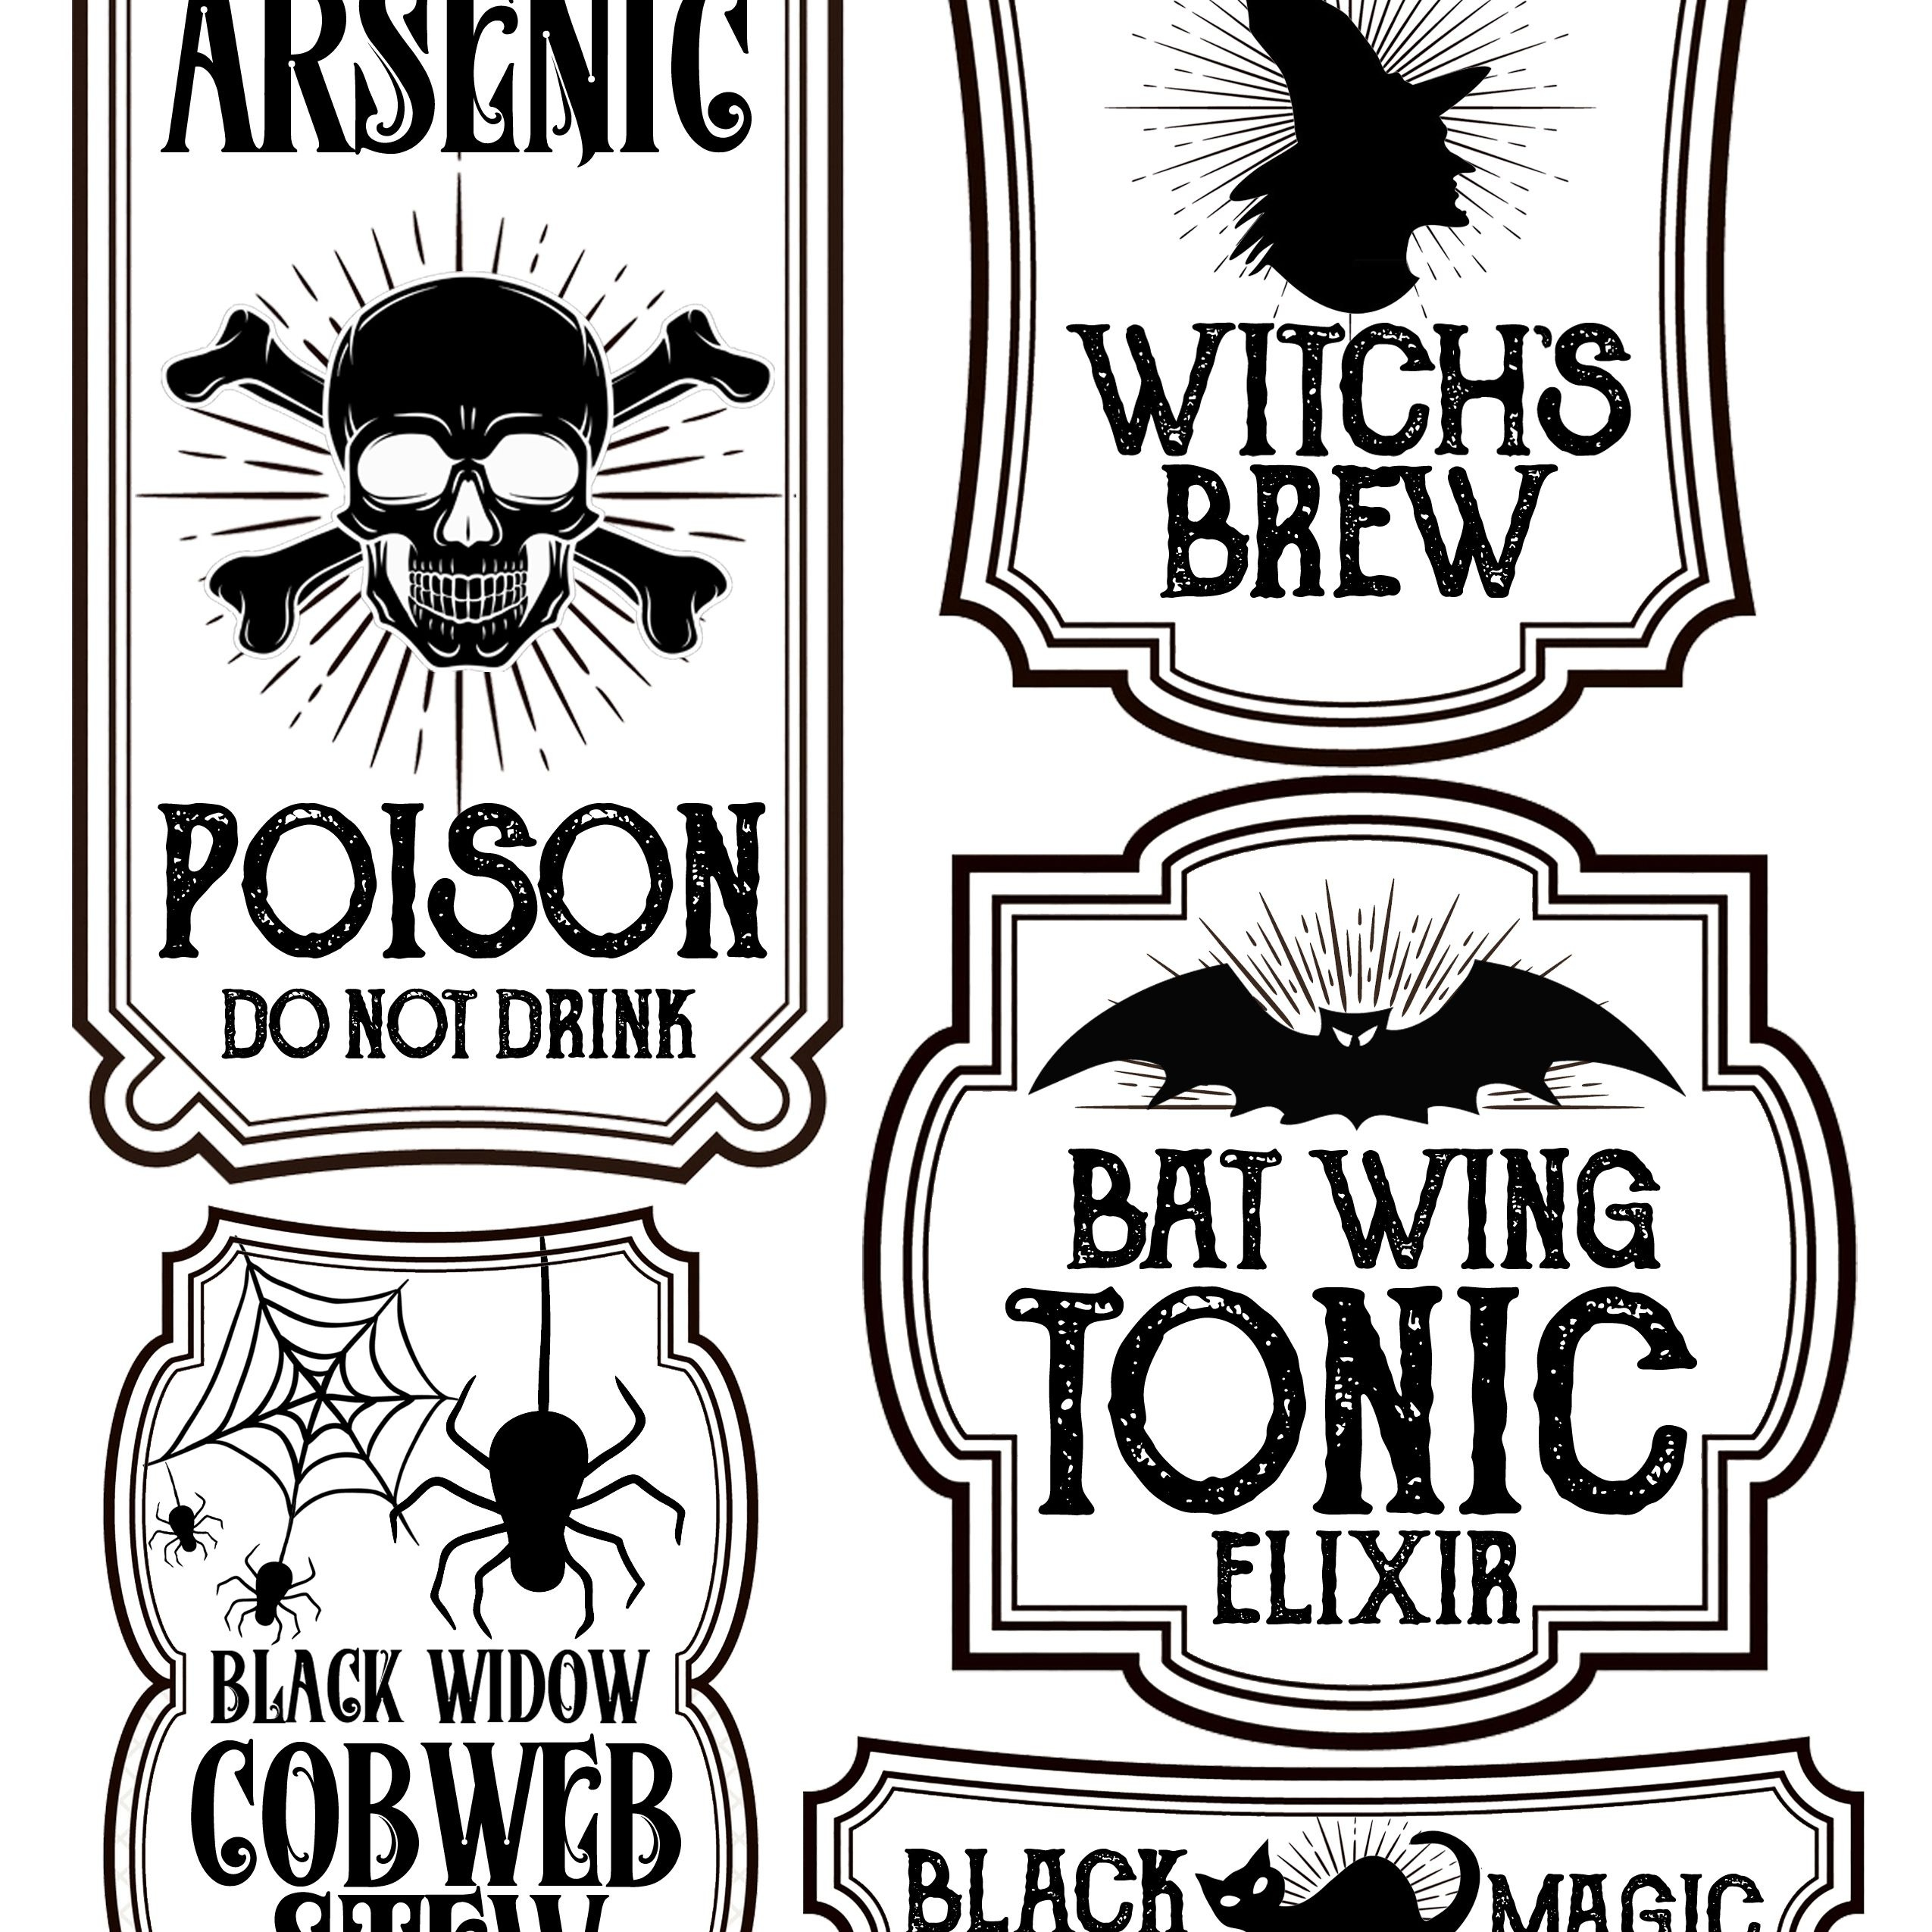 Halloween Bottle Labels - Free Printables - Potions Labels   Art - Free Printable Halloween Bottle Labels